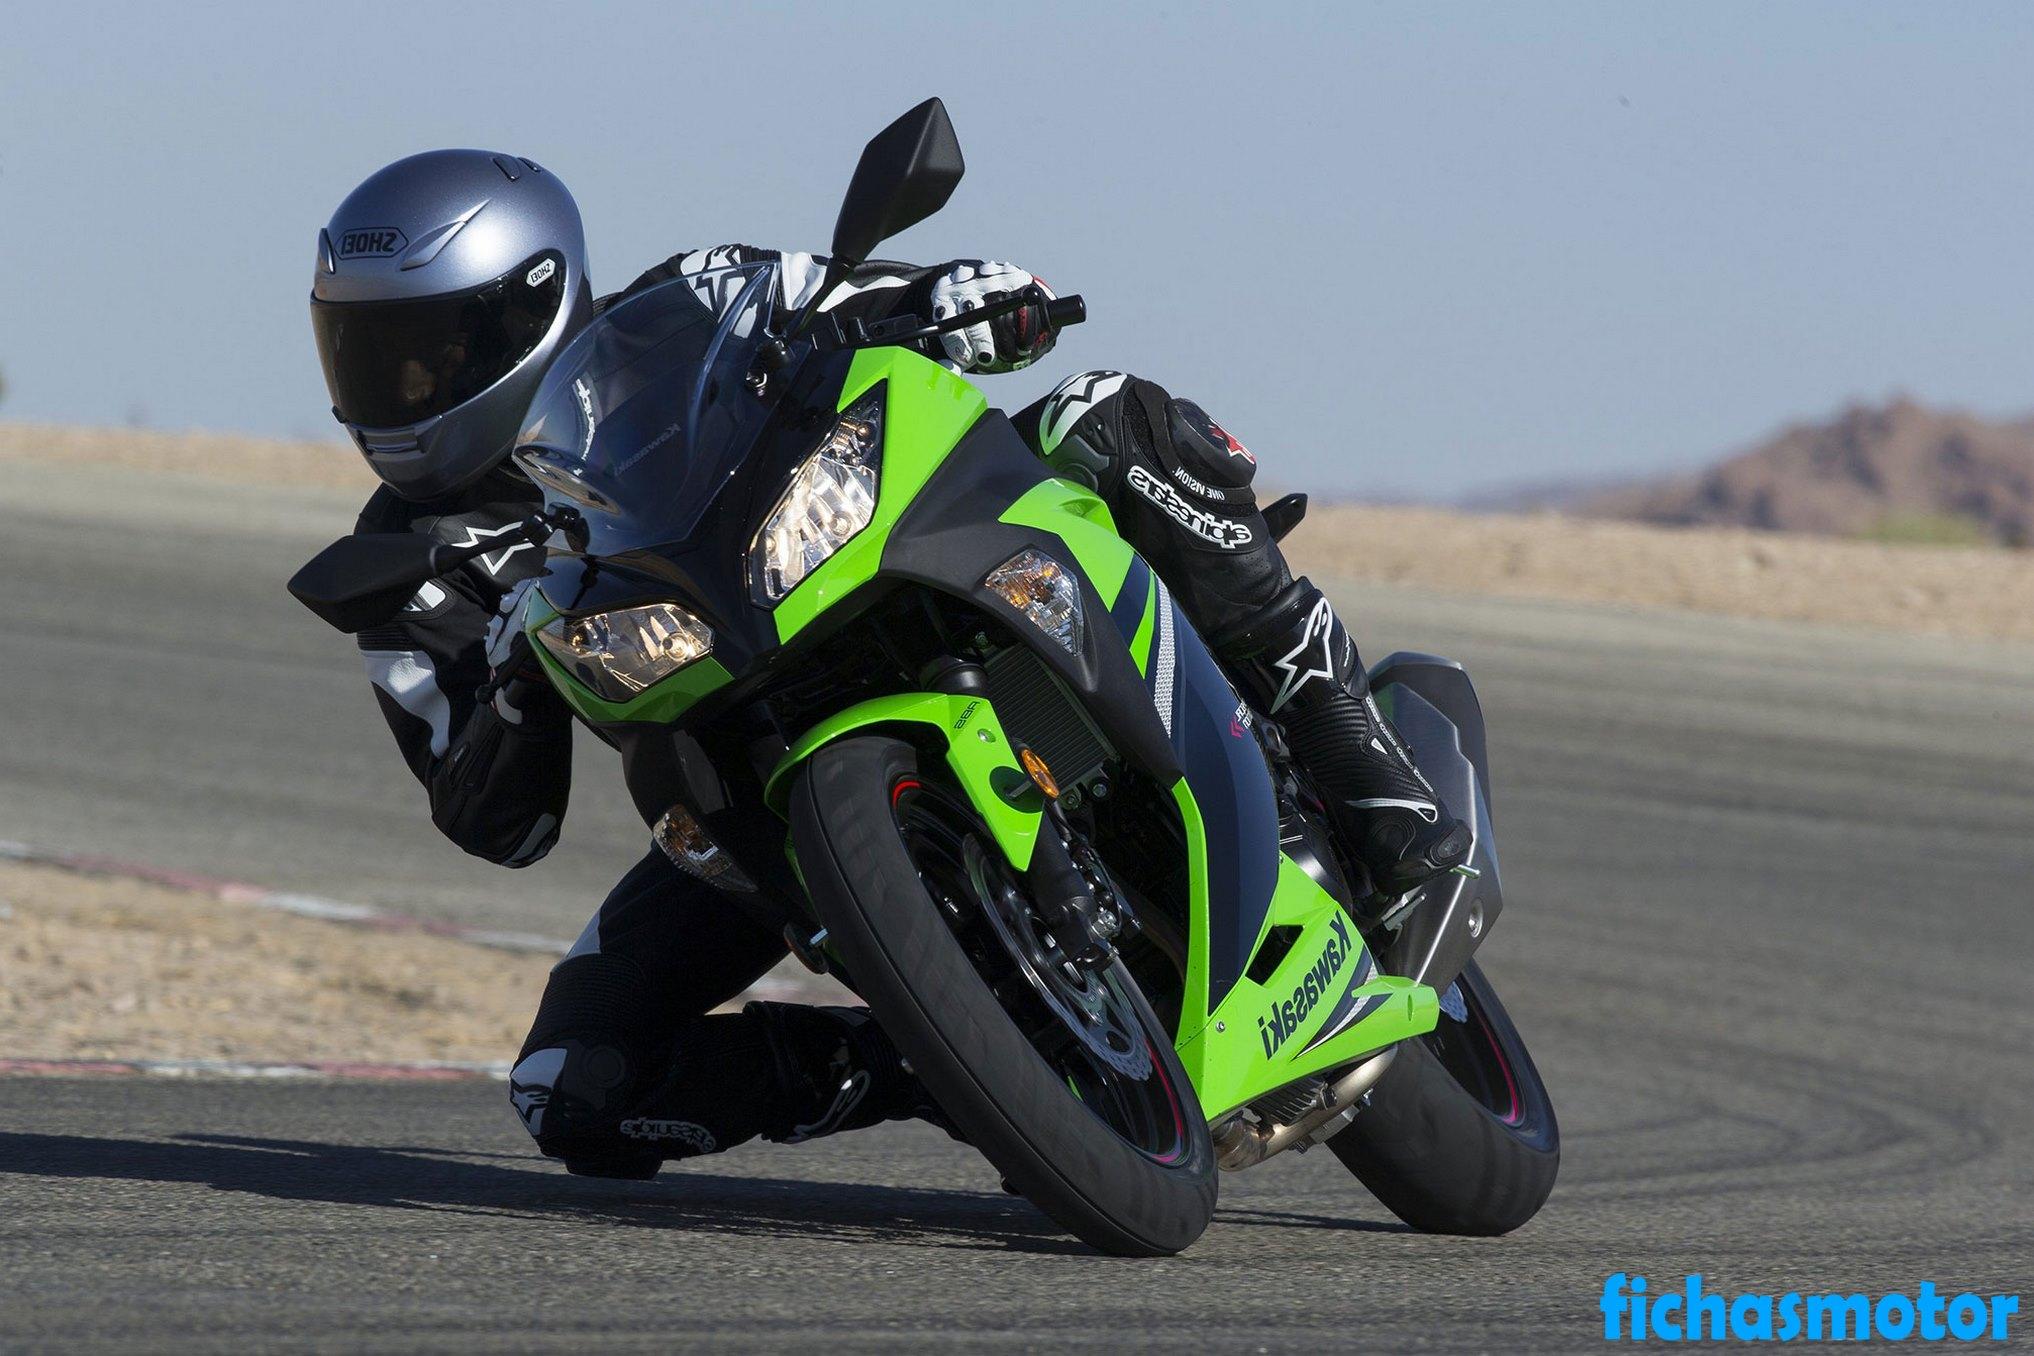 Imagen moto Kawasaki ninja 300 año 2014